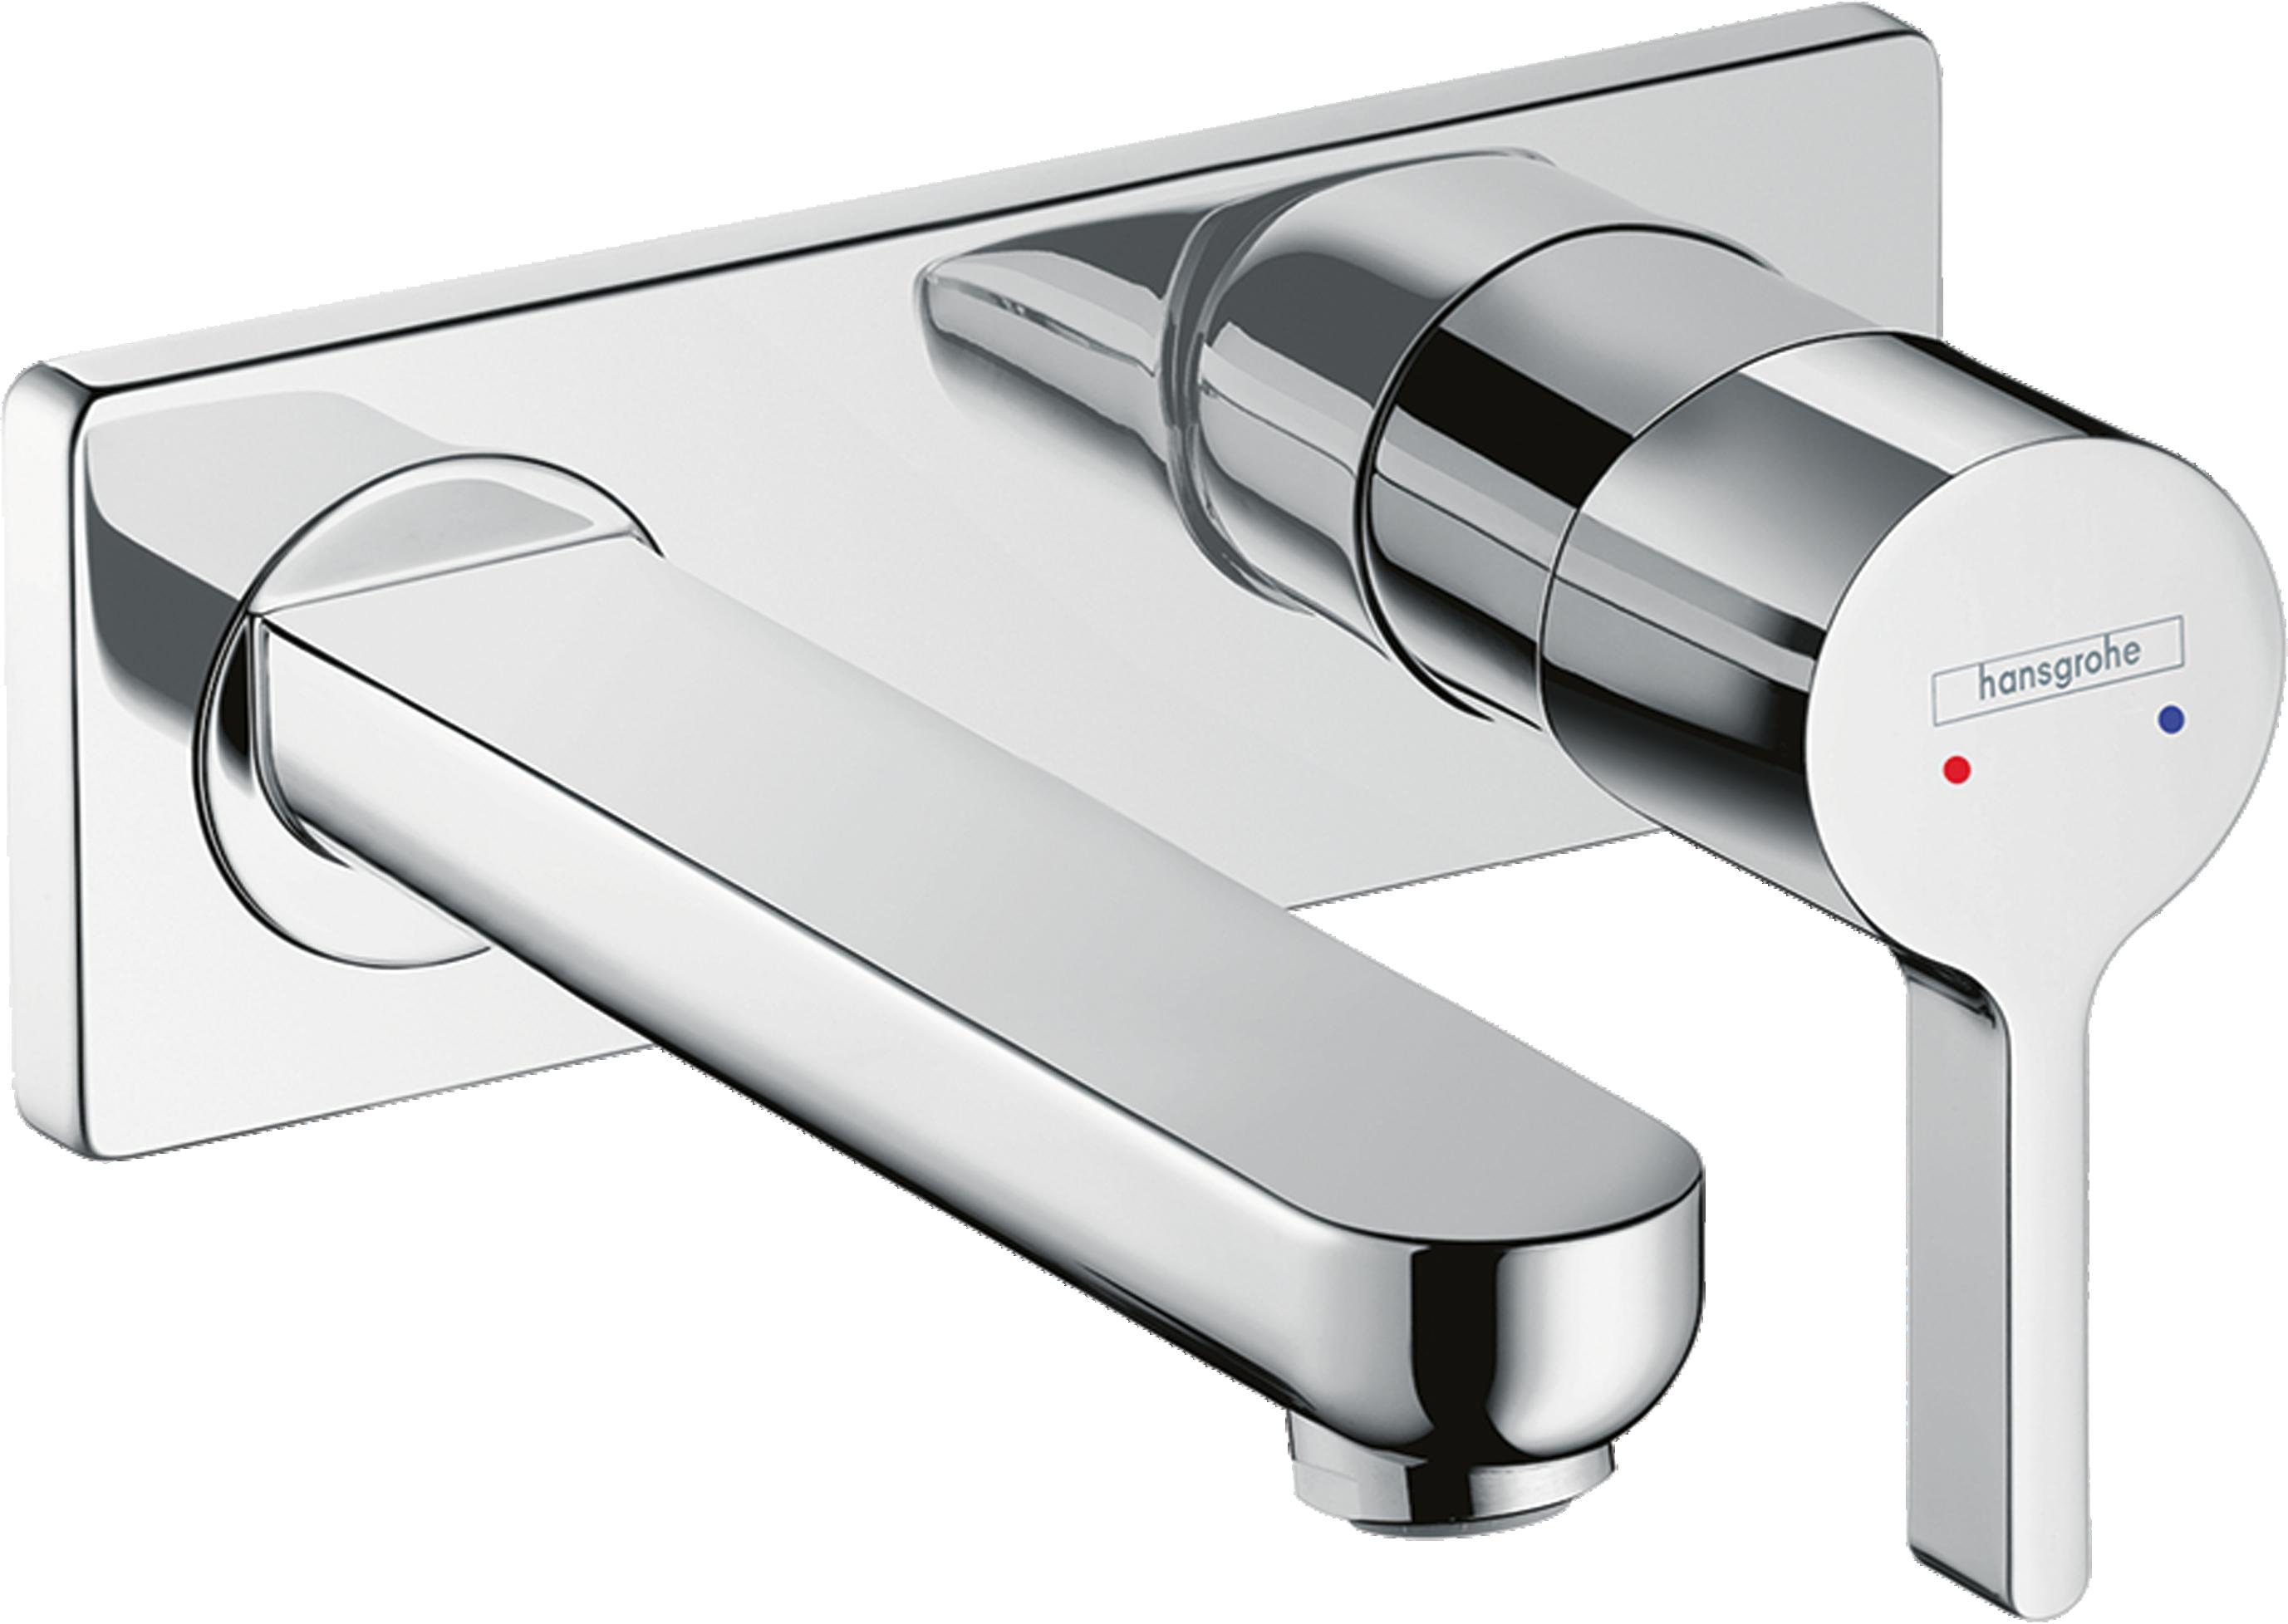 Küchenarmatur Wandmontage Hansgrohe ~ hansgrohe unterputz armatur latest hansgrohe thermostat unterputz metris chrom mit with